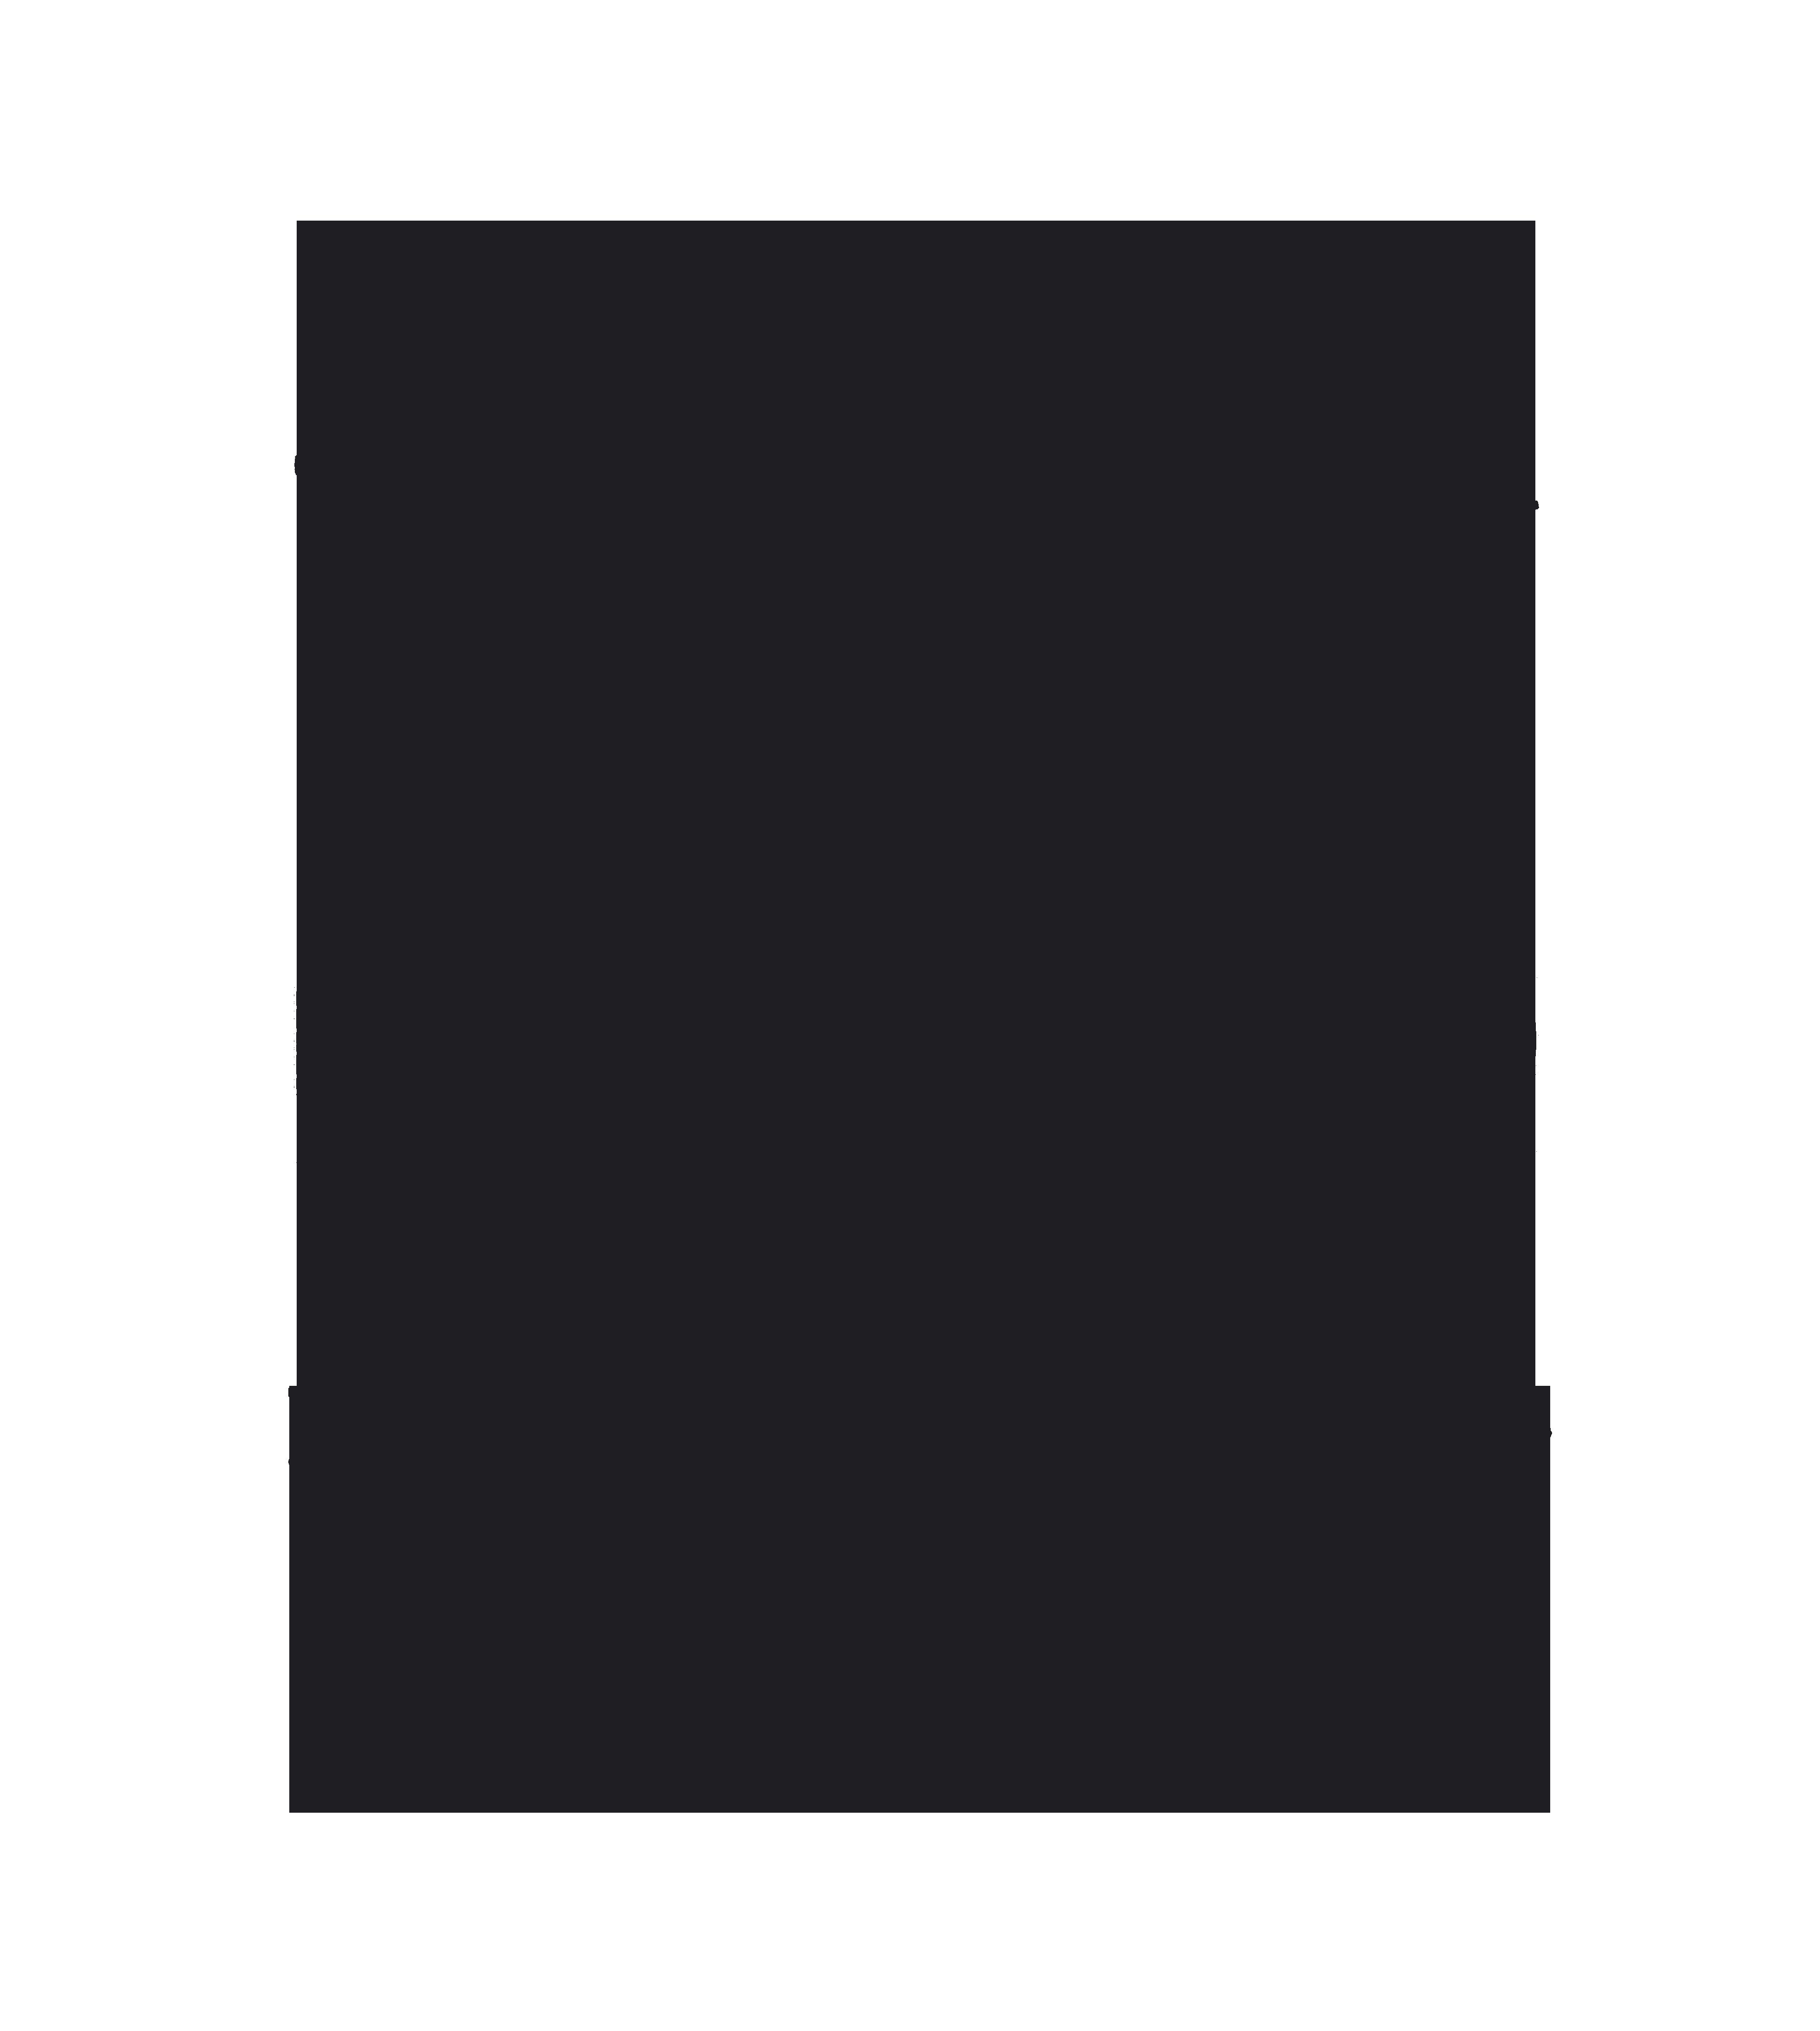 Derek Copenhaver Photography + Videography